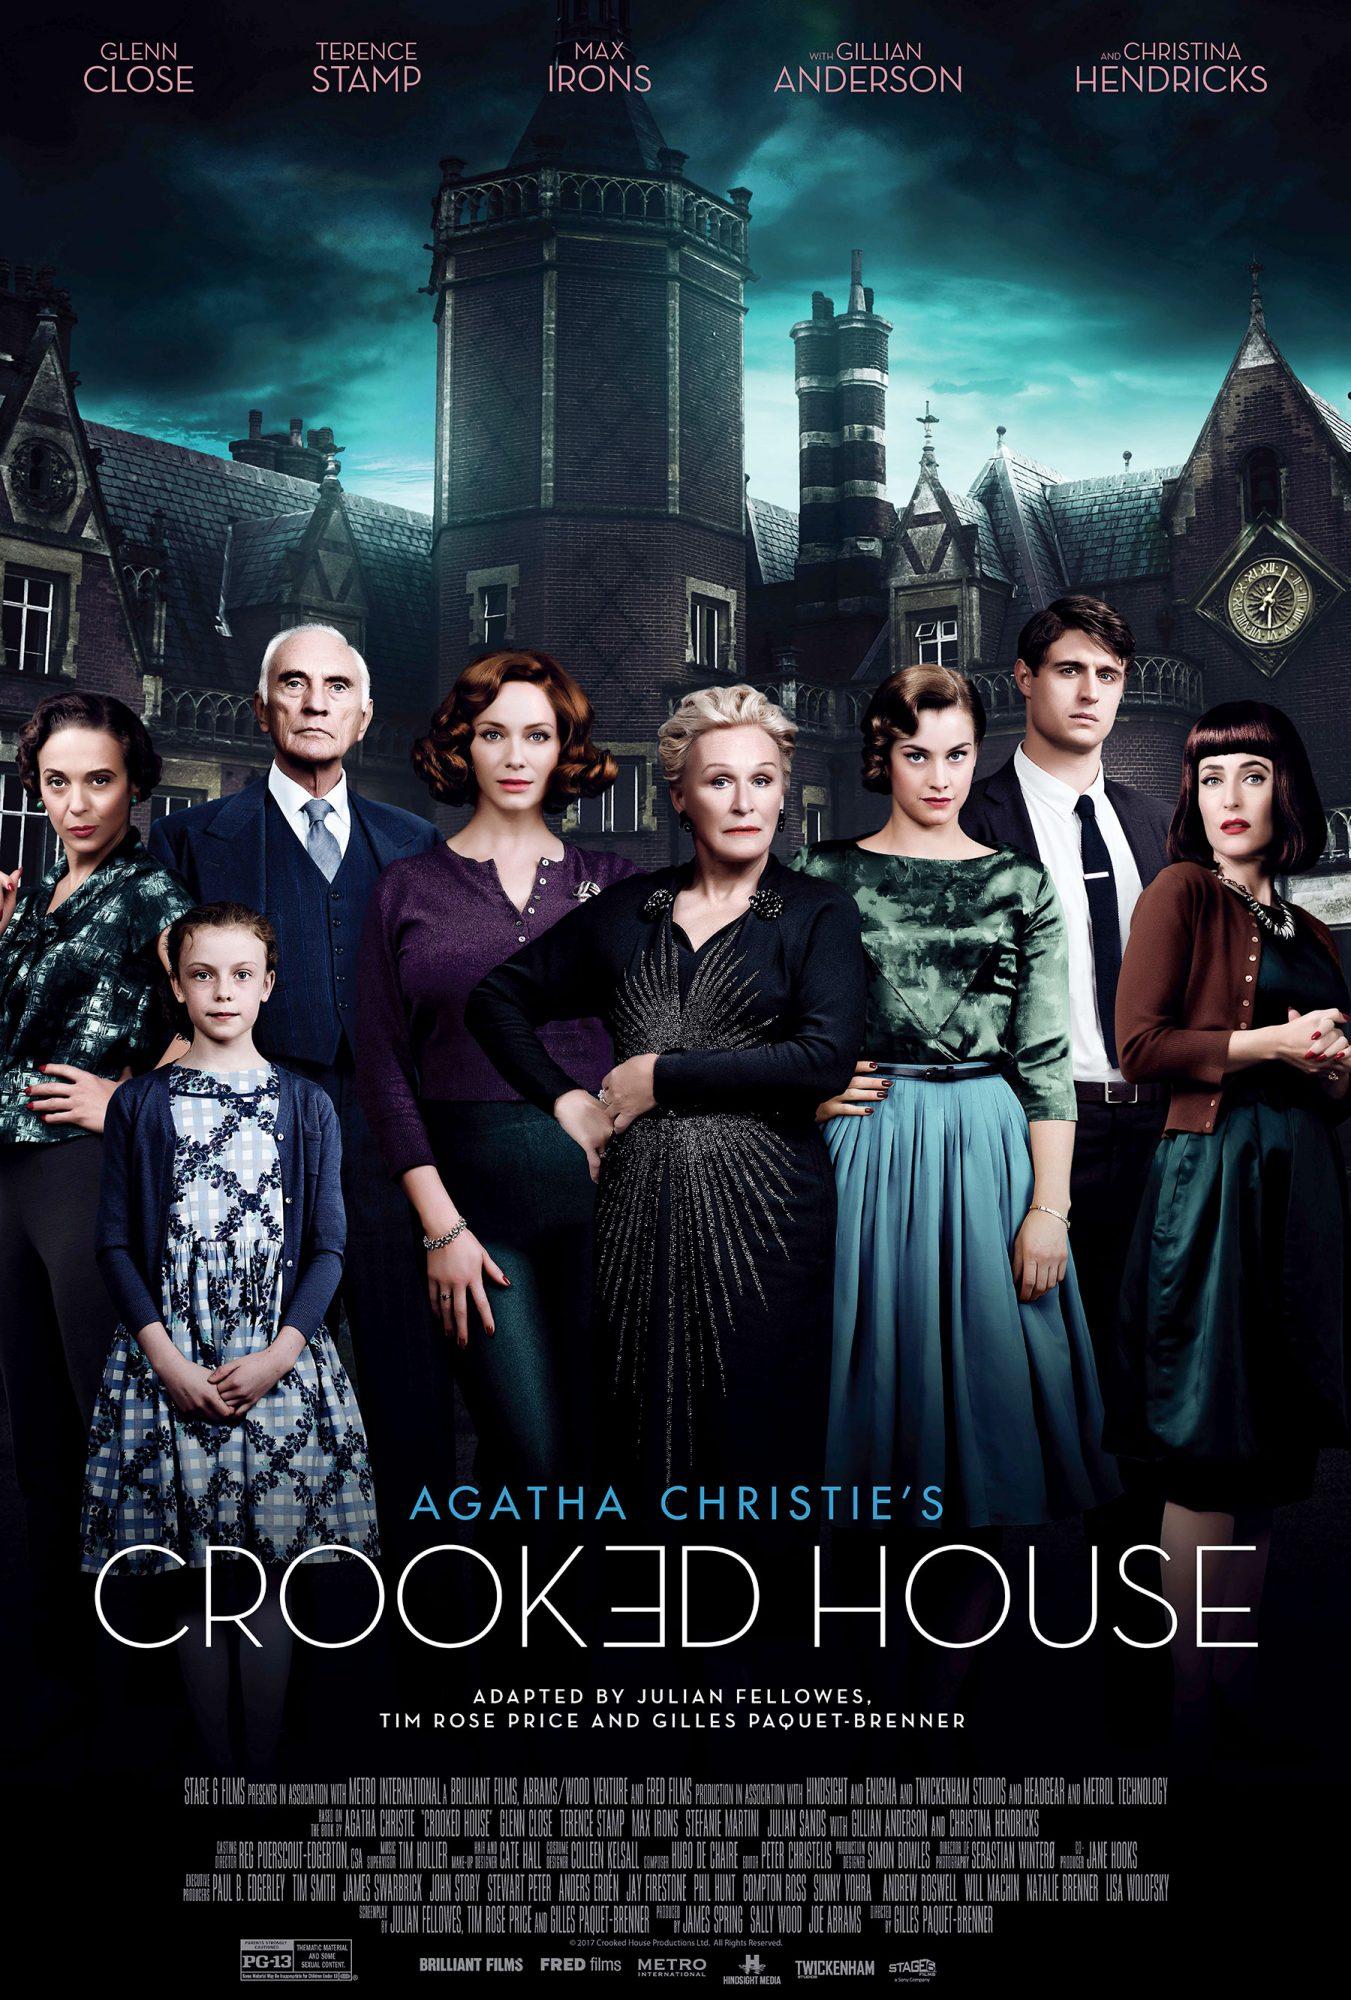 CrookedHouse_OneSheet_Final_Trim